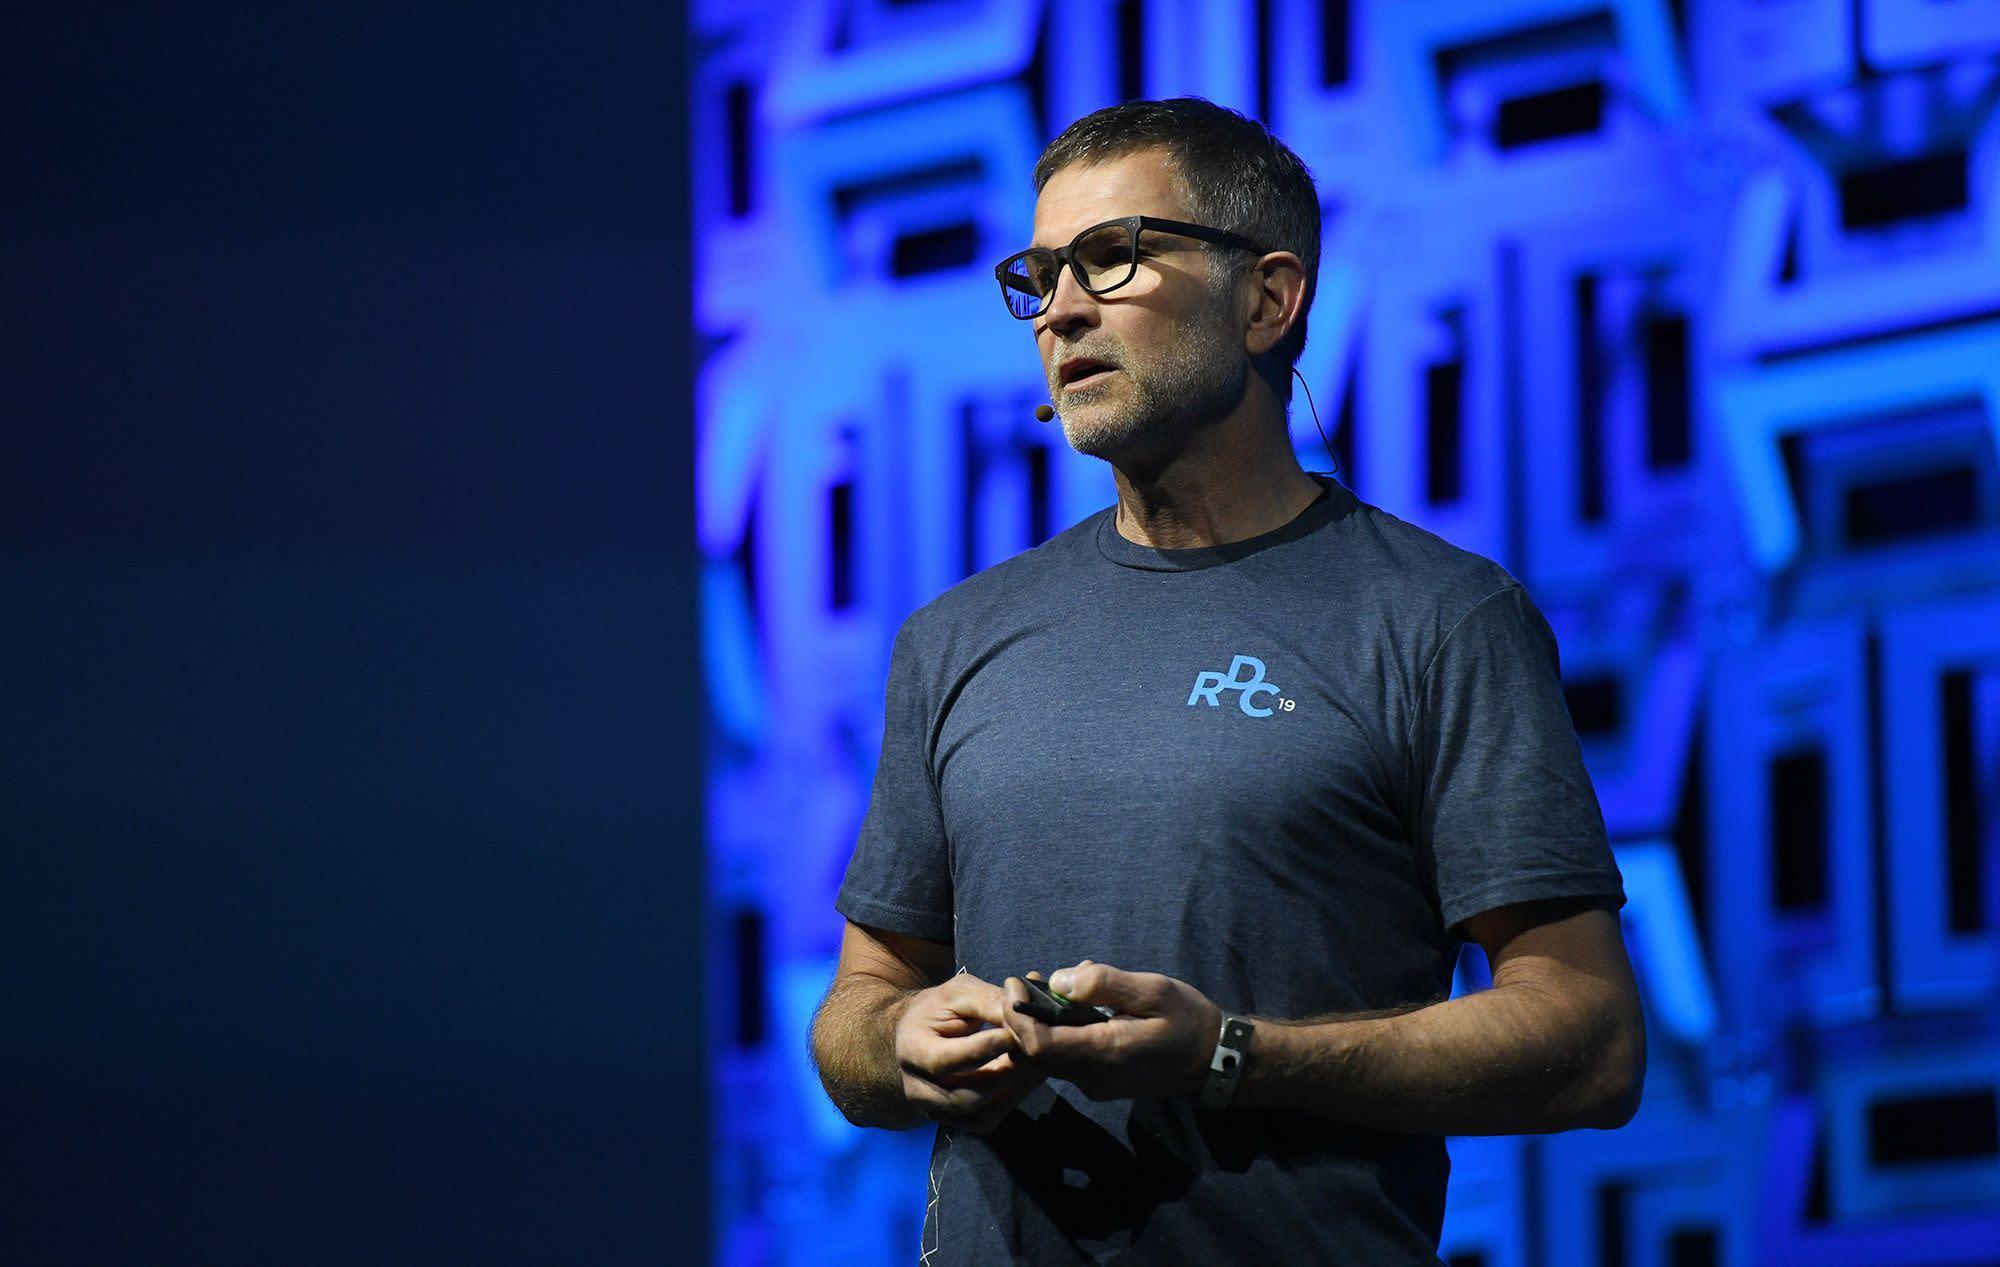 Roblox CEO Creates a $3 Billion Fortune From Virtual World